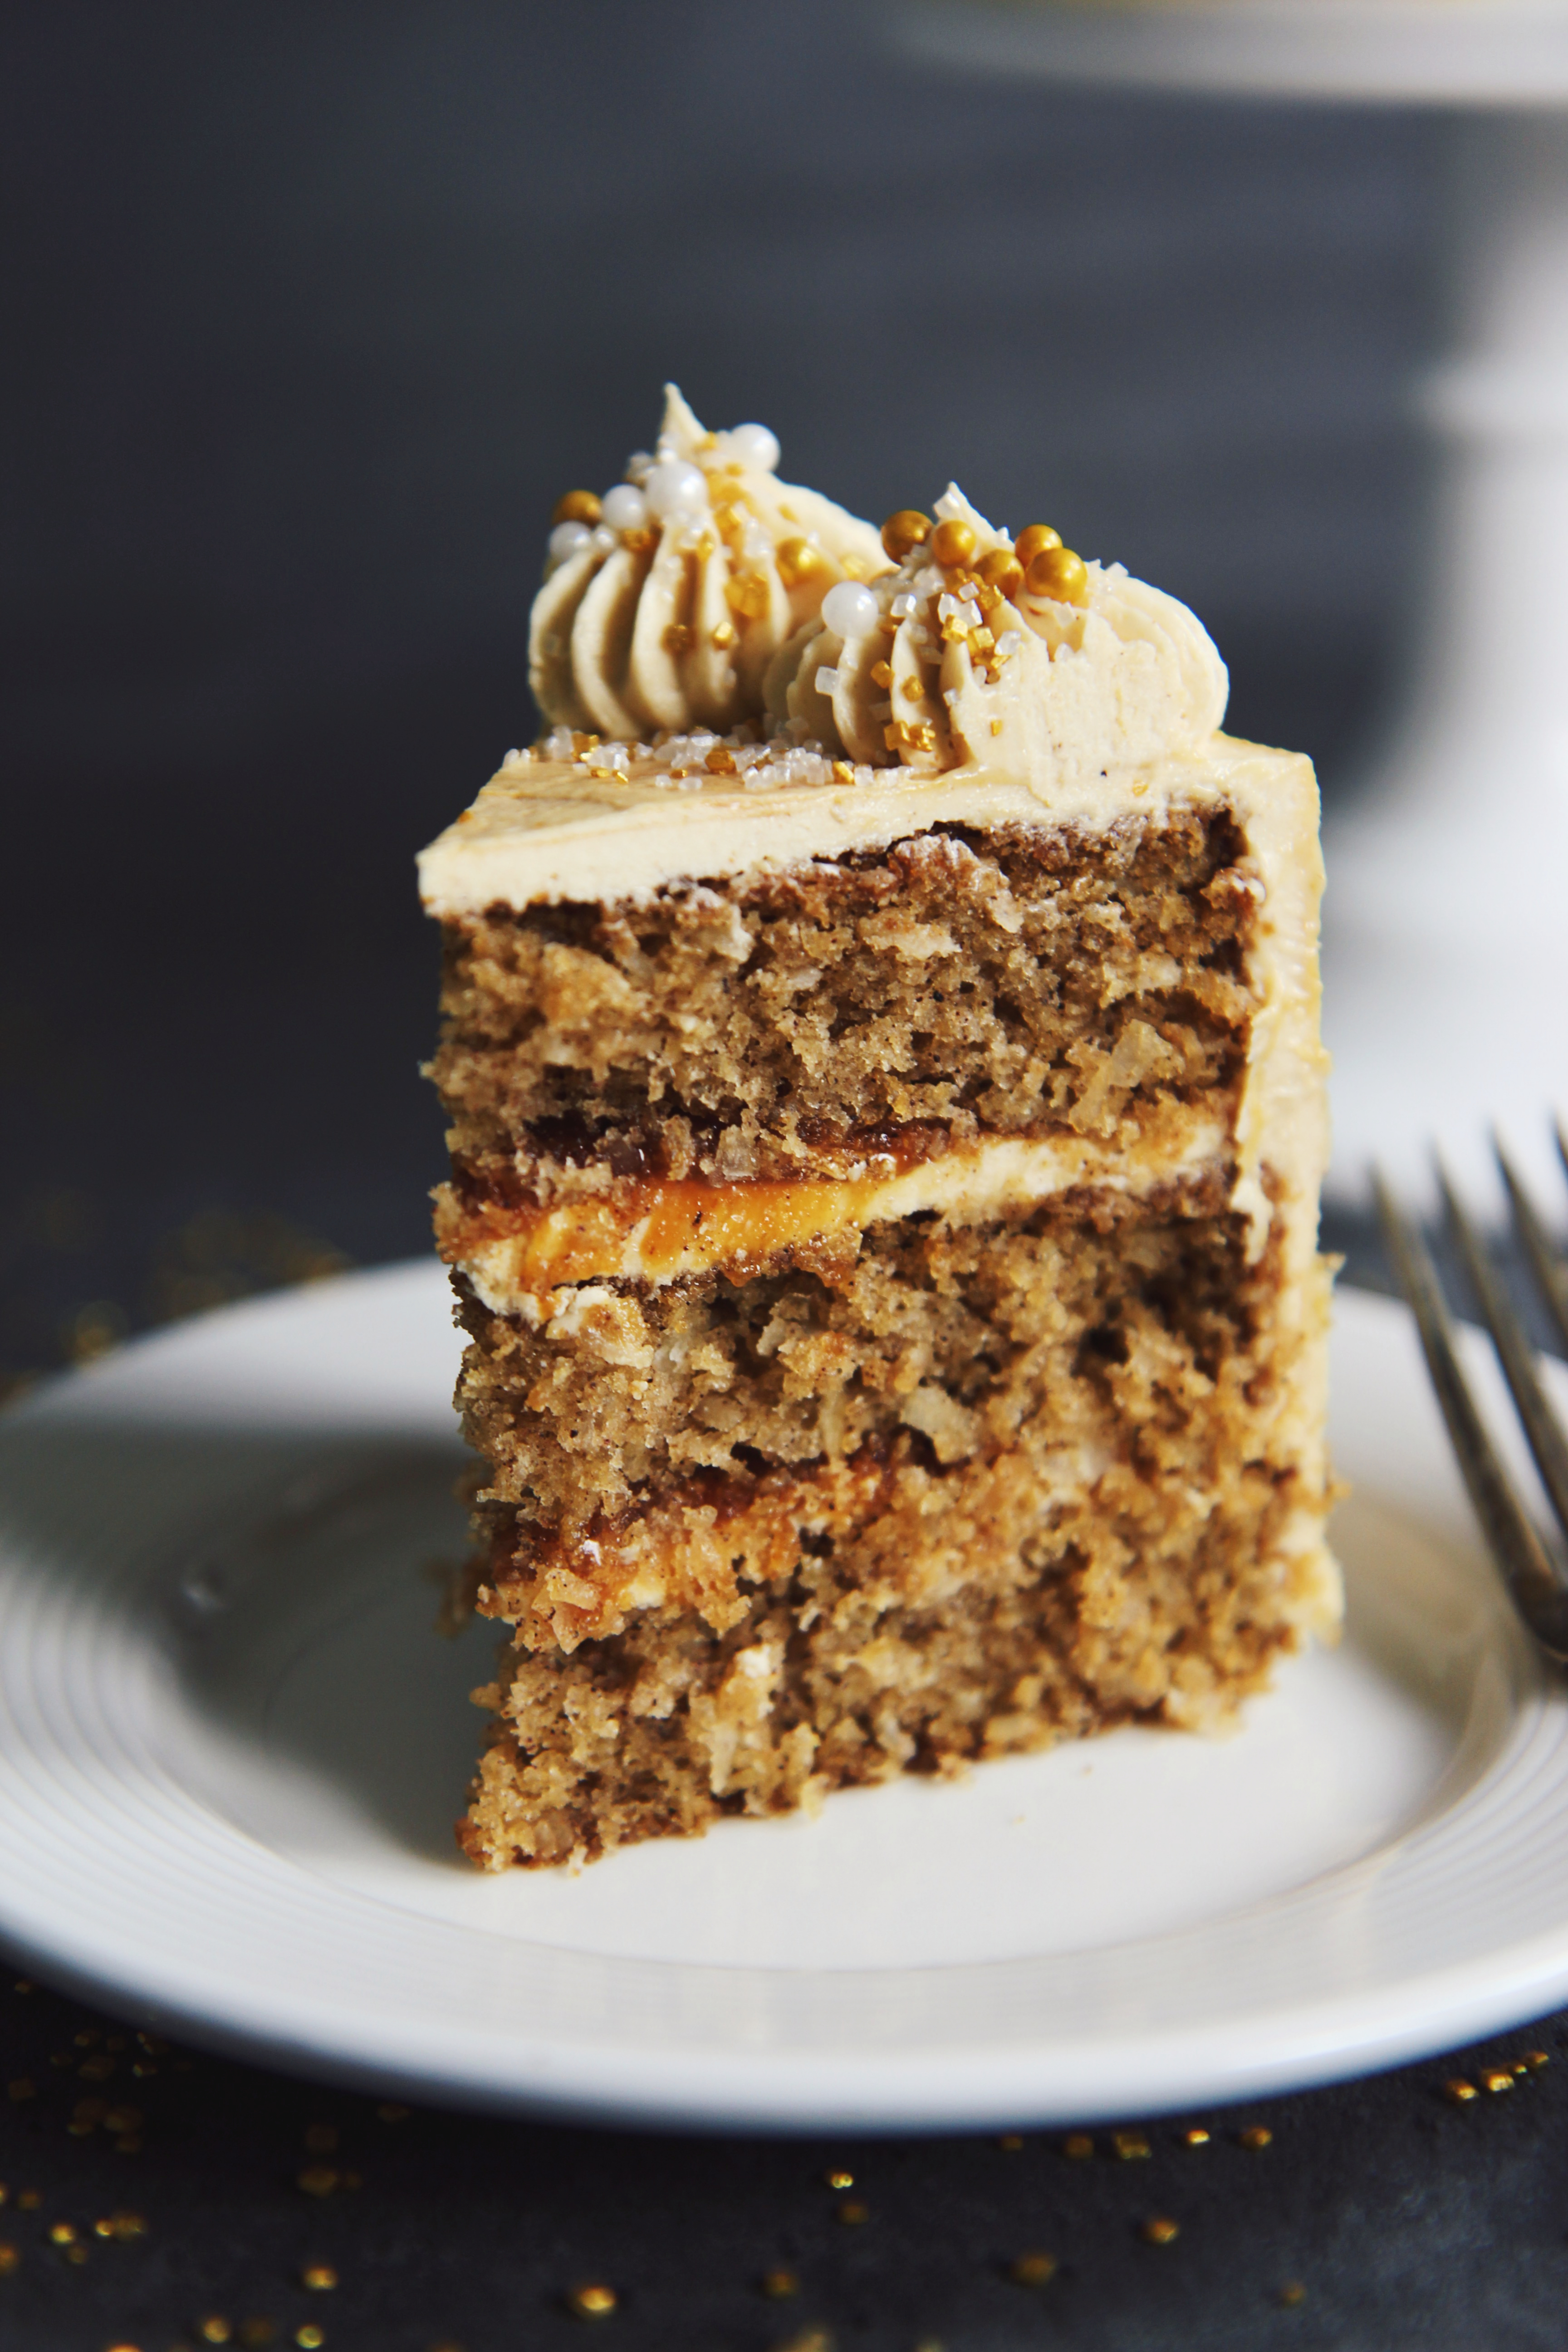 Parsnip and Miso Caramel Cake | La Pêche Fraîche